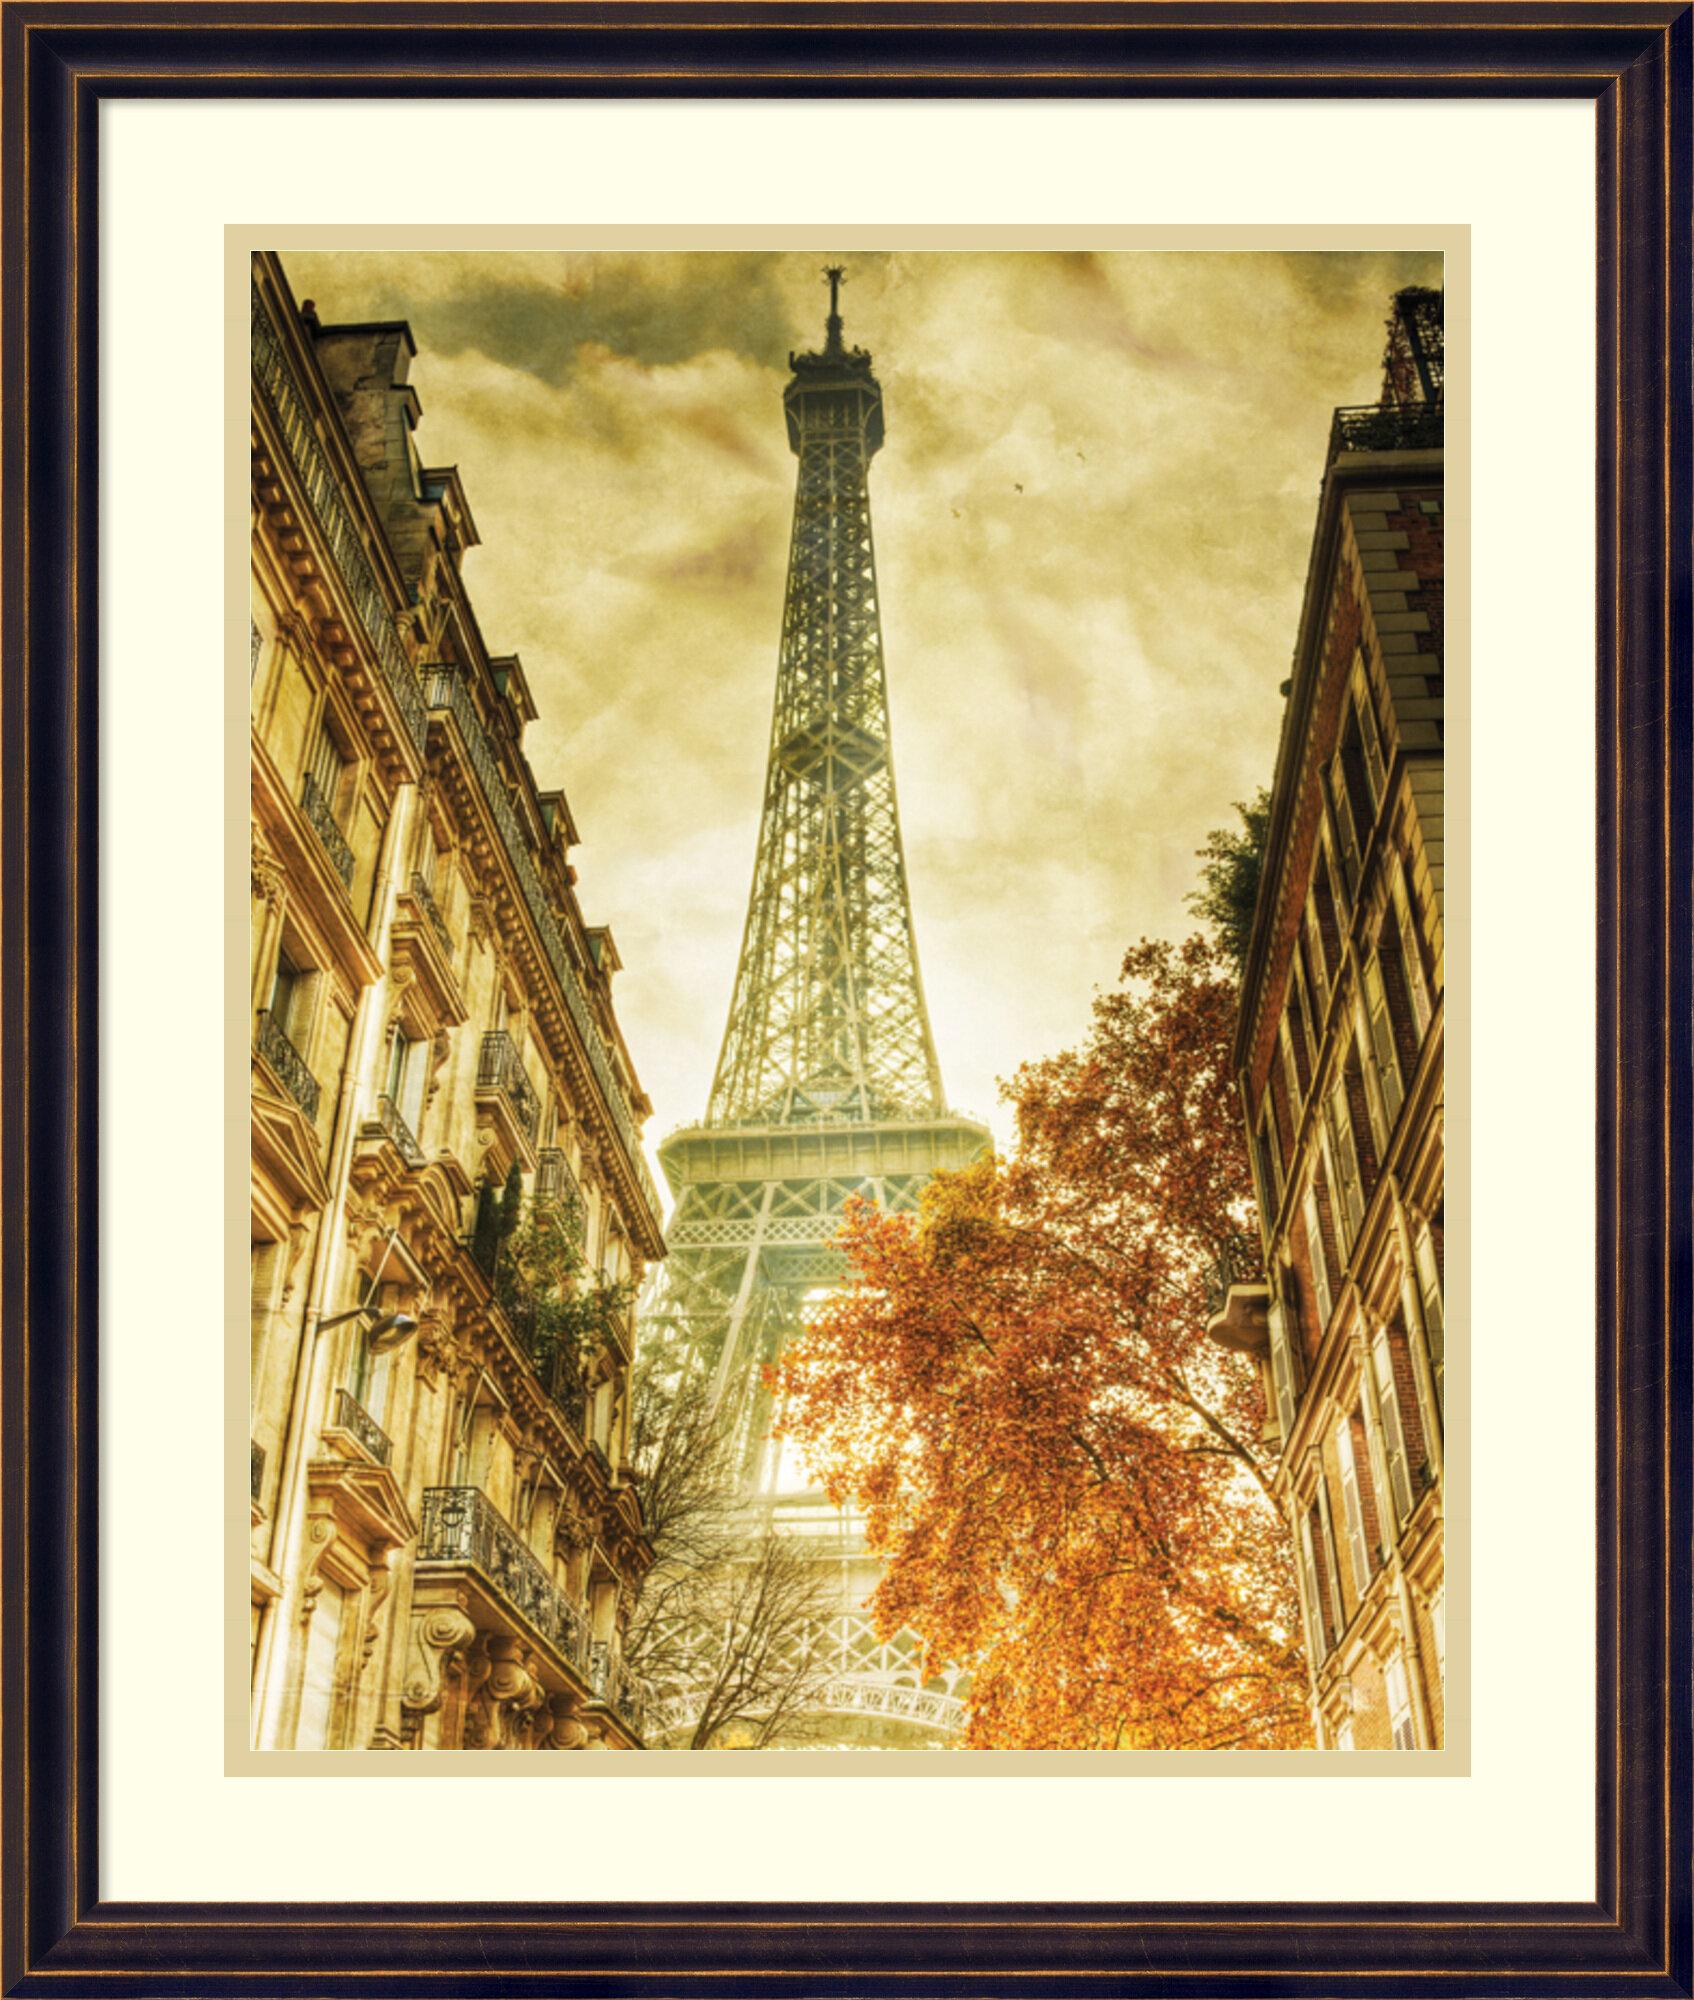 Charlton Home \'Vintage Eiffel Tower\' Framed Graphic Art Print | Wayfair